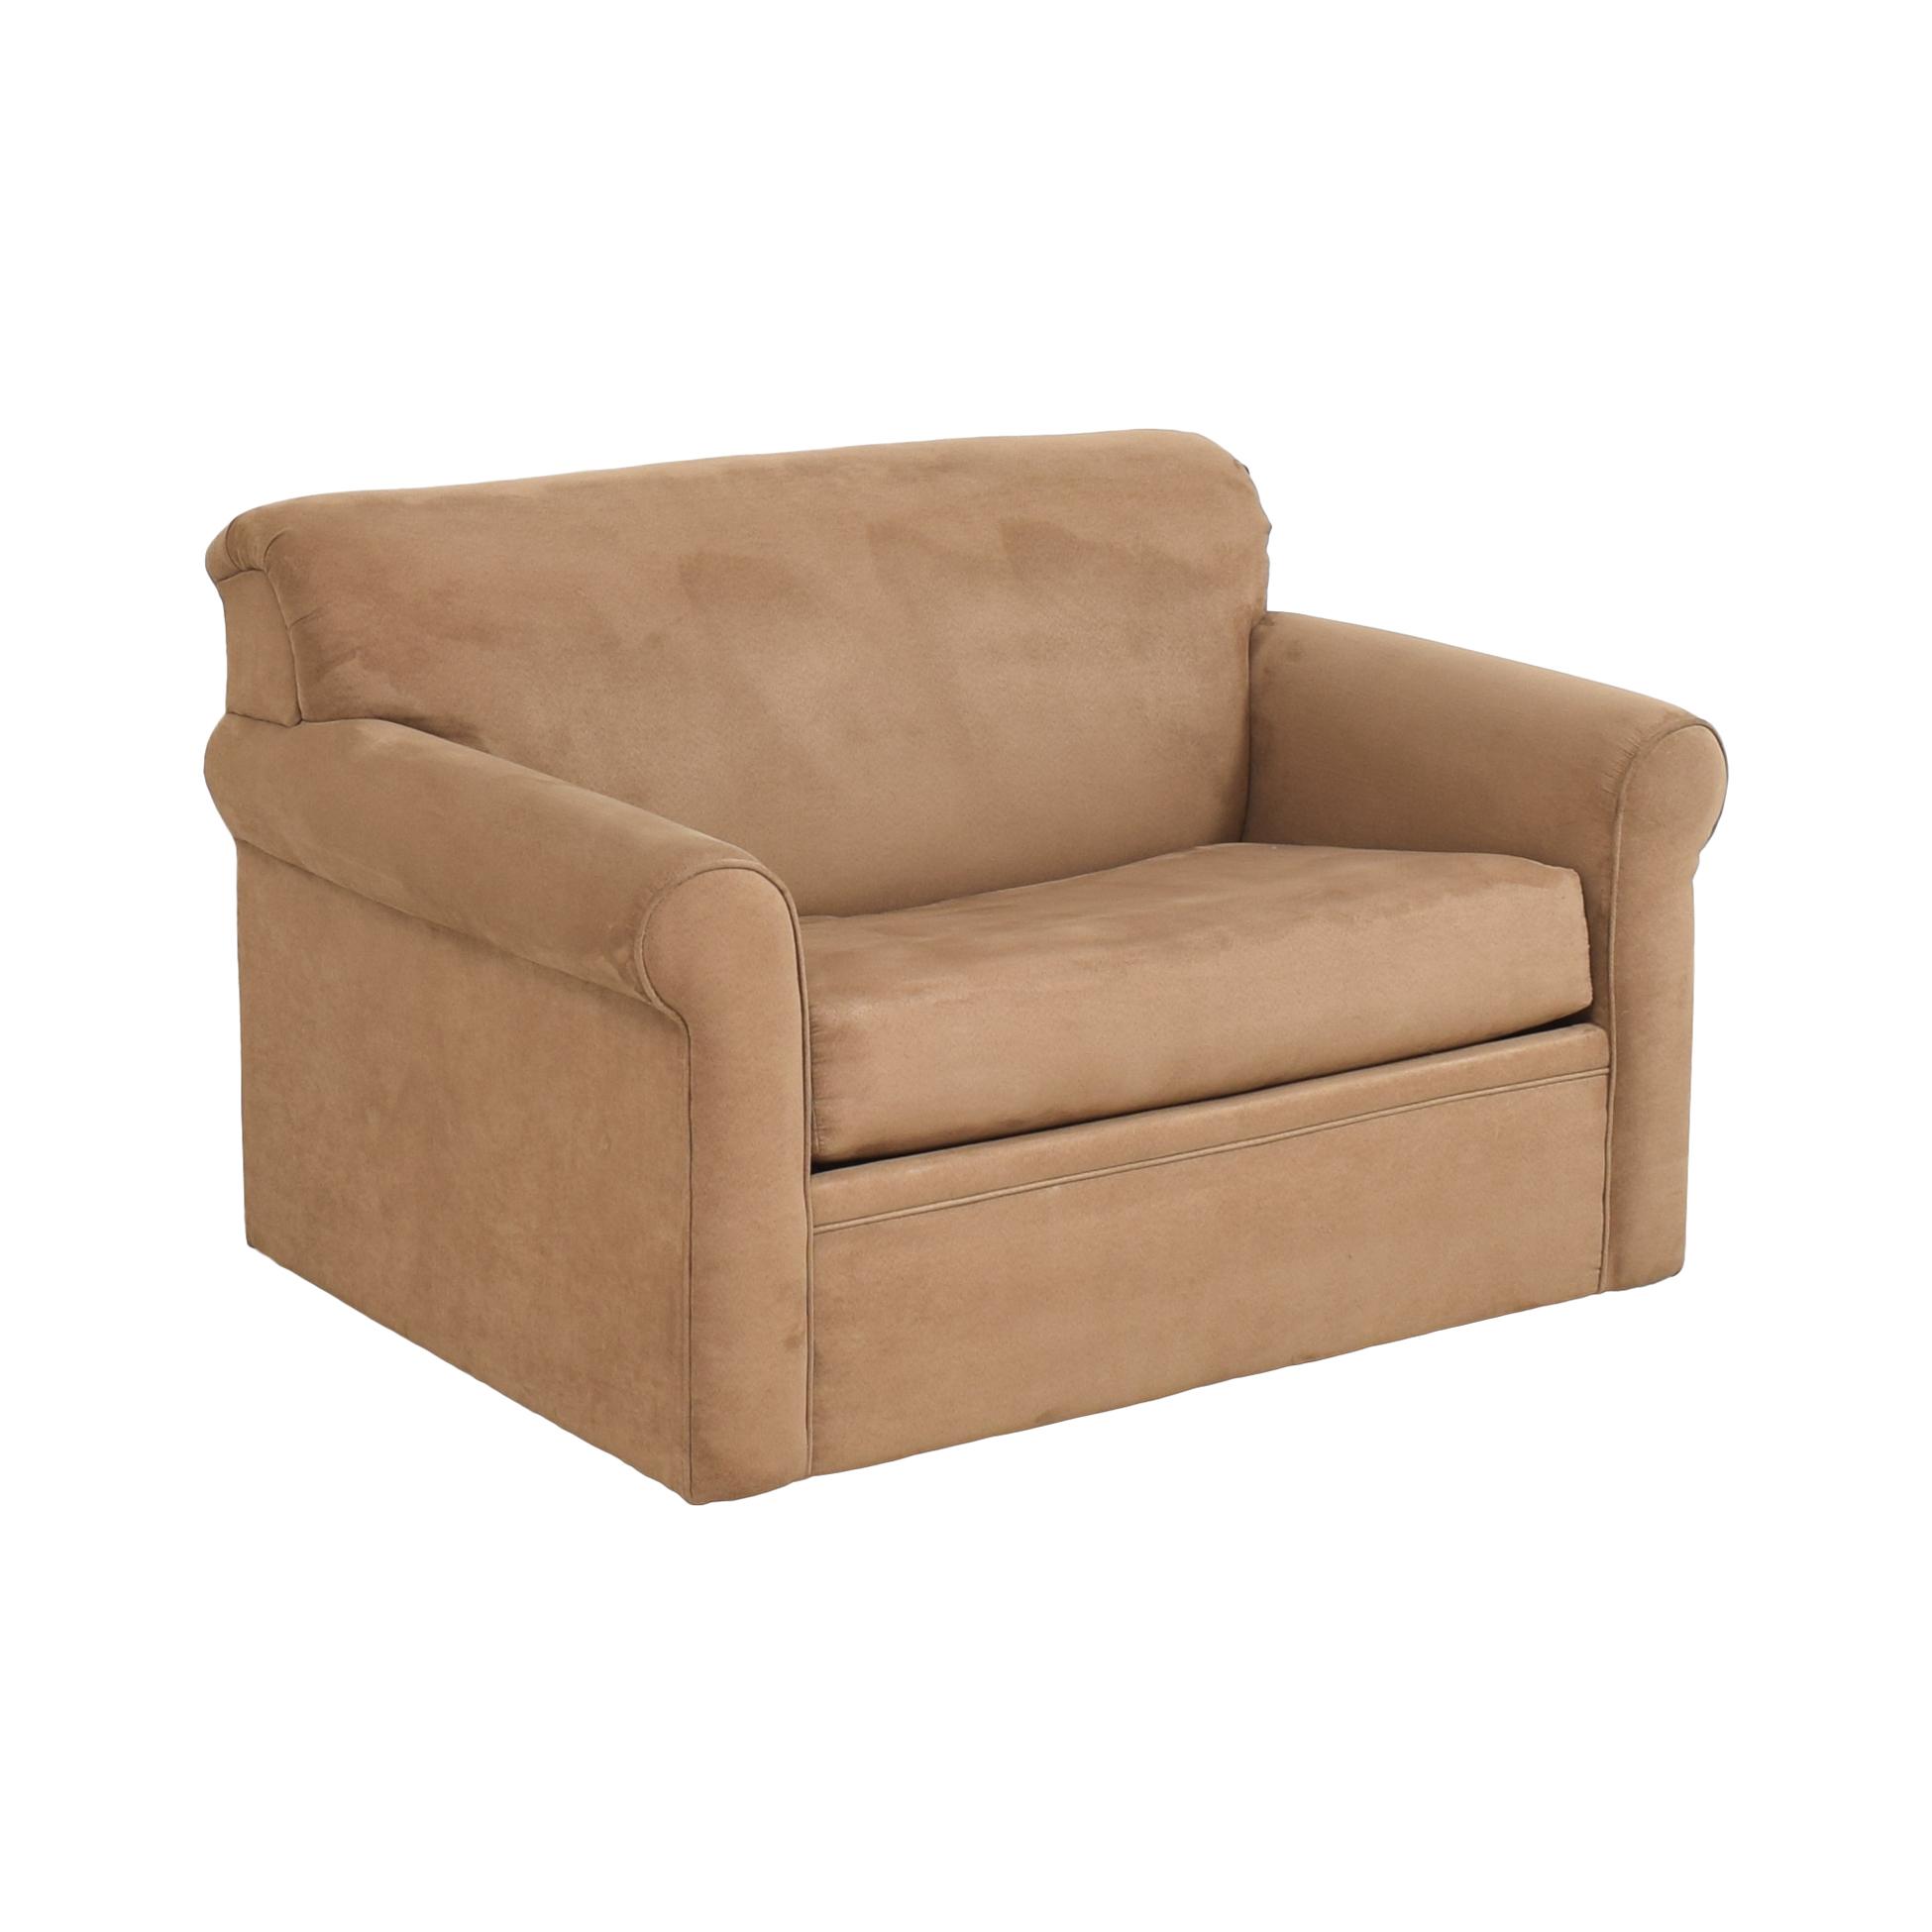 Overnight Sofa Overnight Sofa Sleeper Chair price